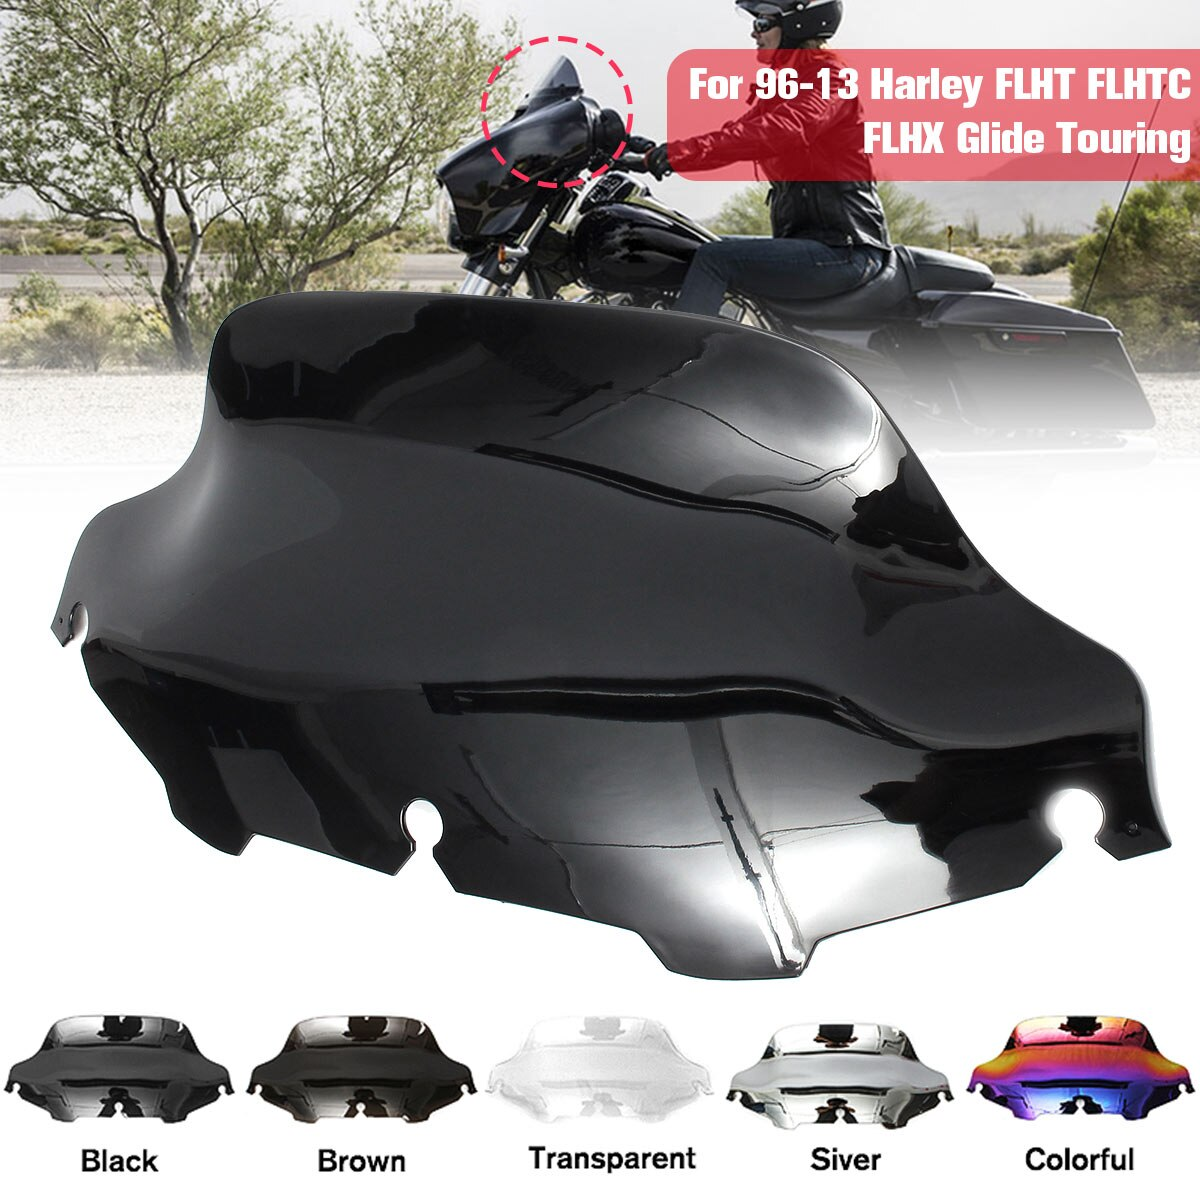 Parabrisas de 8 pulgadas para motocicleta, deflectores de viento para Harley/Electra/Street Glide FLHX FLHTK FLHTC 1996-2013